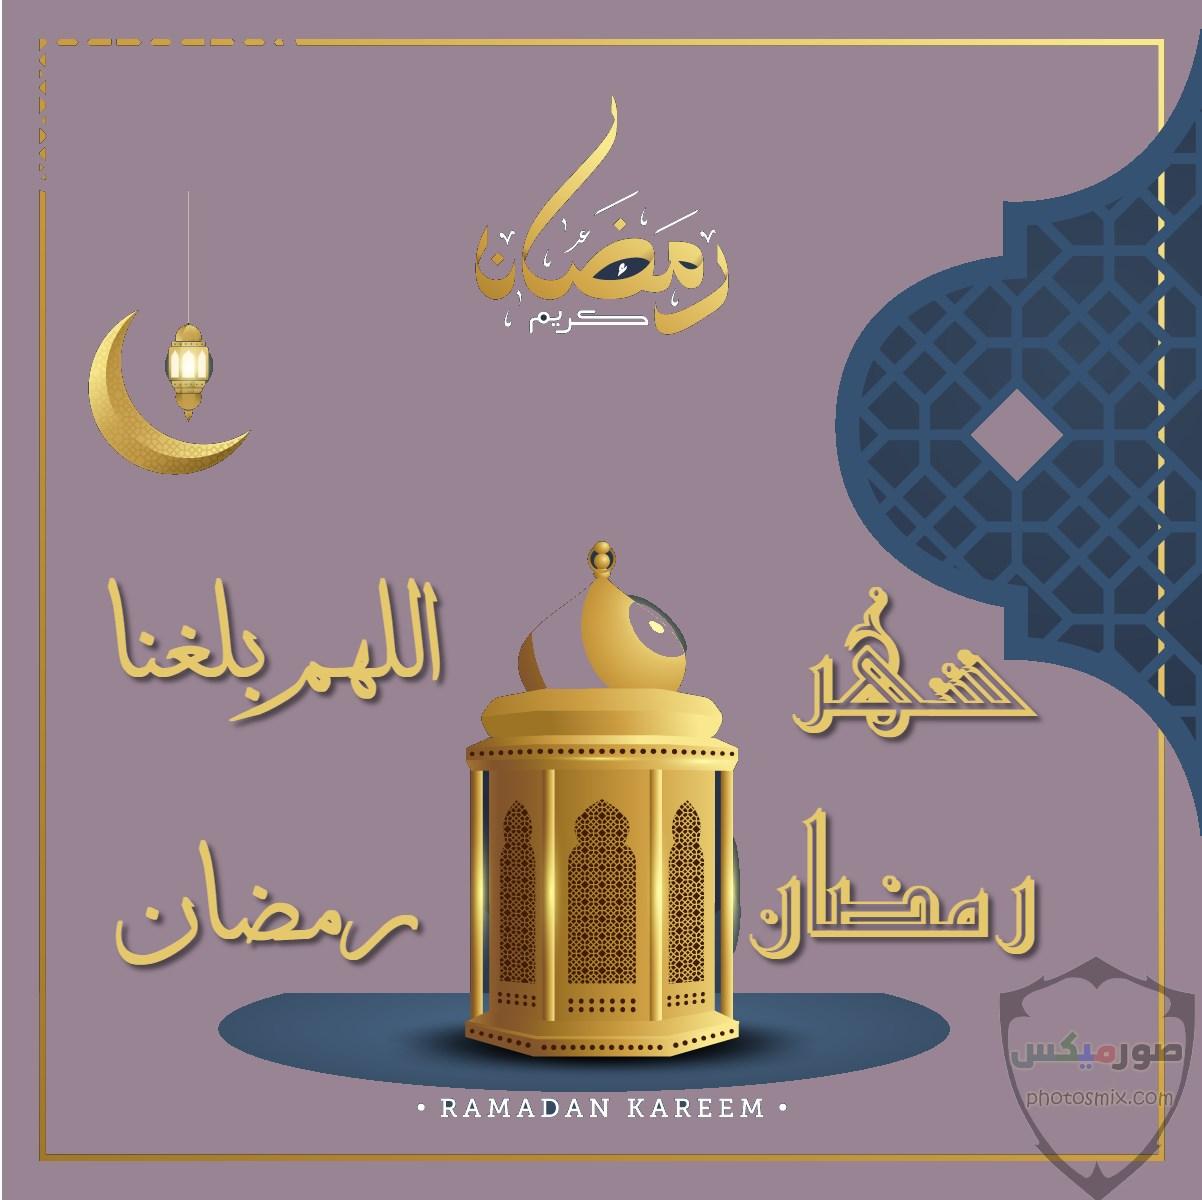 صور تهنئة بمناسبة رمضان 2020 1